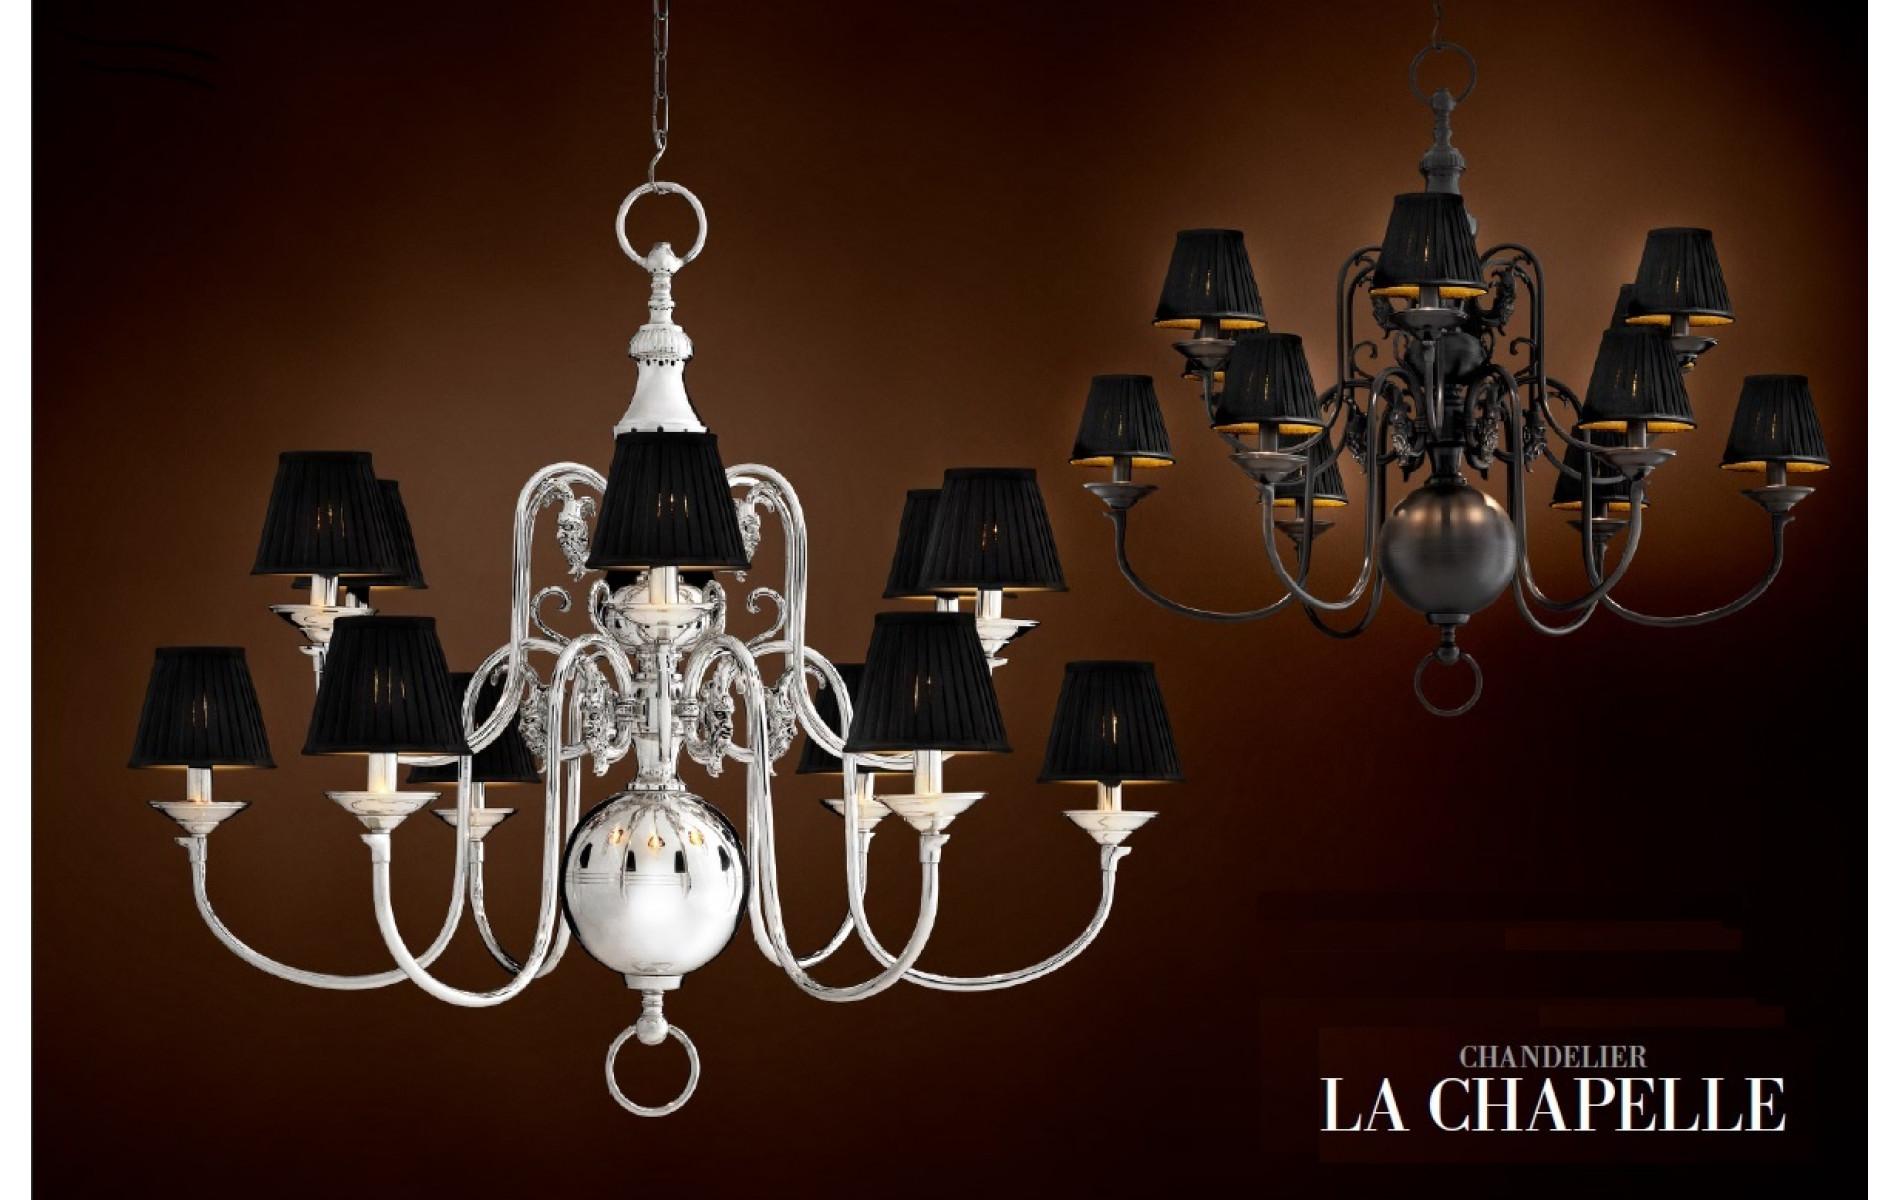 Люстра La Chapelle, фабрика EICHHOLTZ